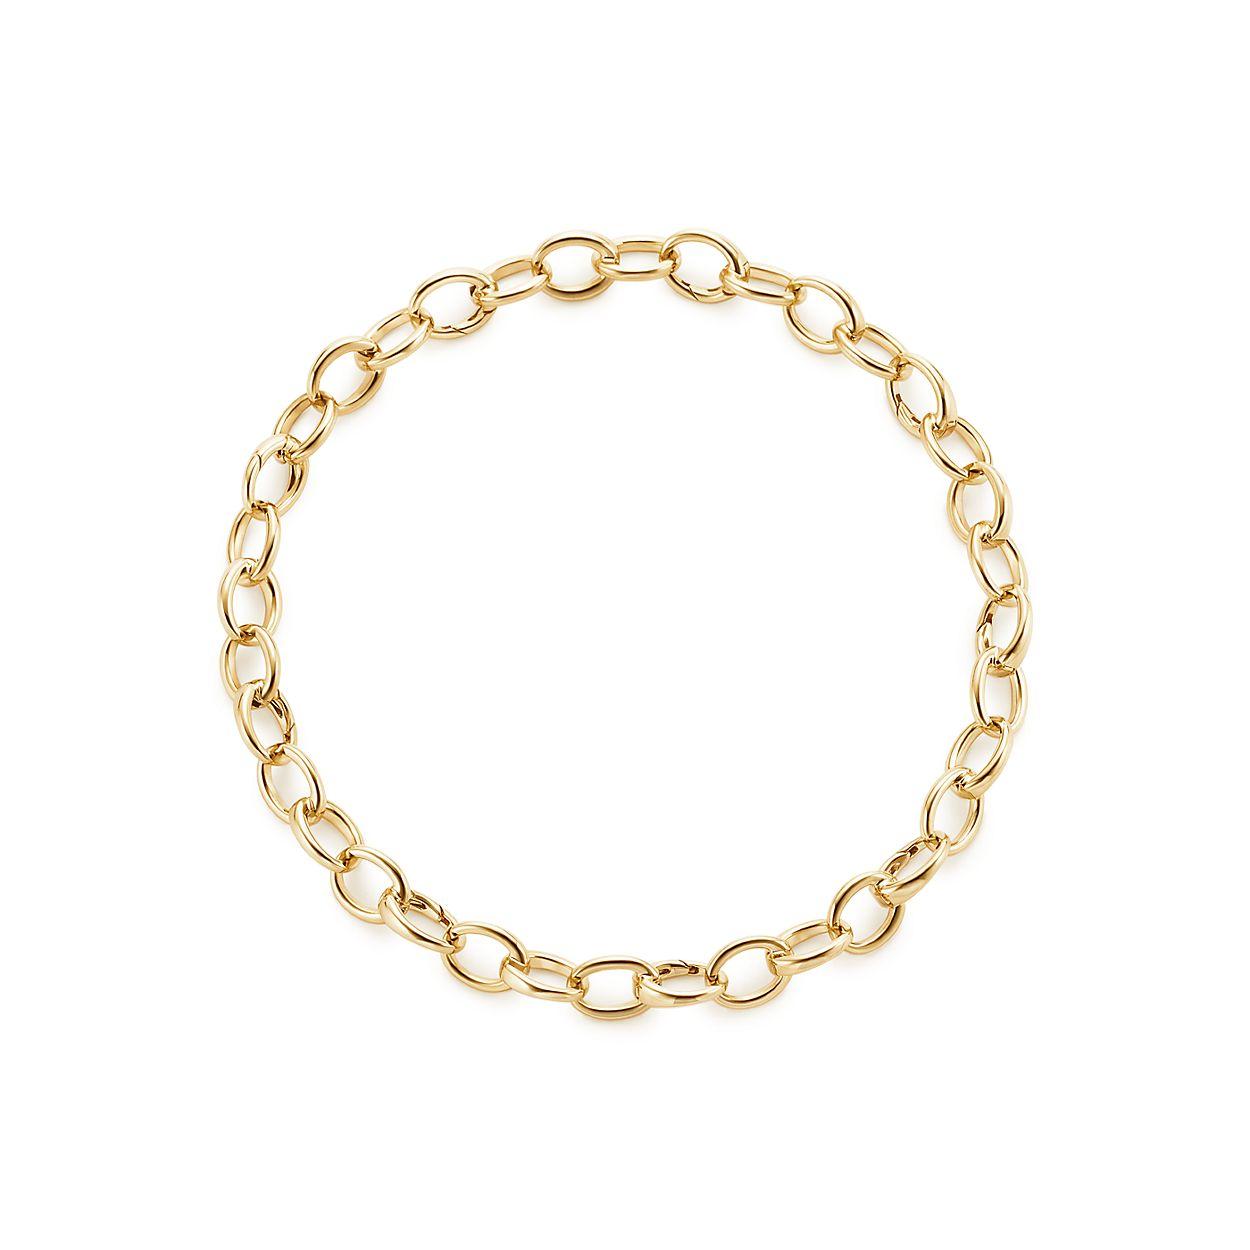 Oval link bracelet in 18k gold, medium  | Tiffany & Co